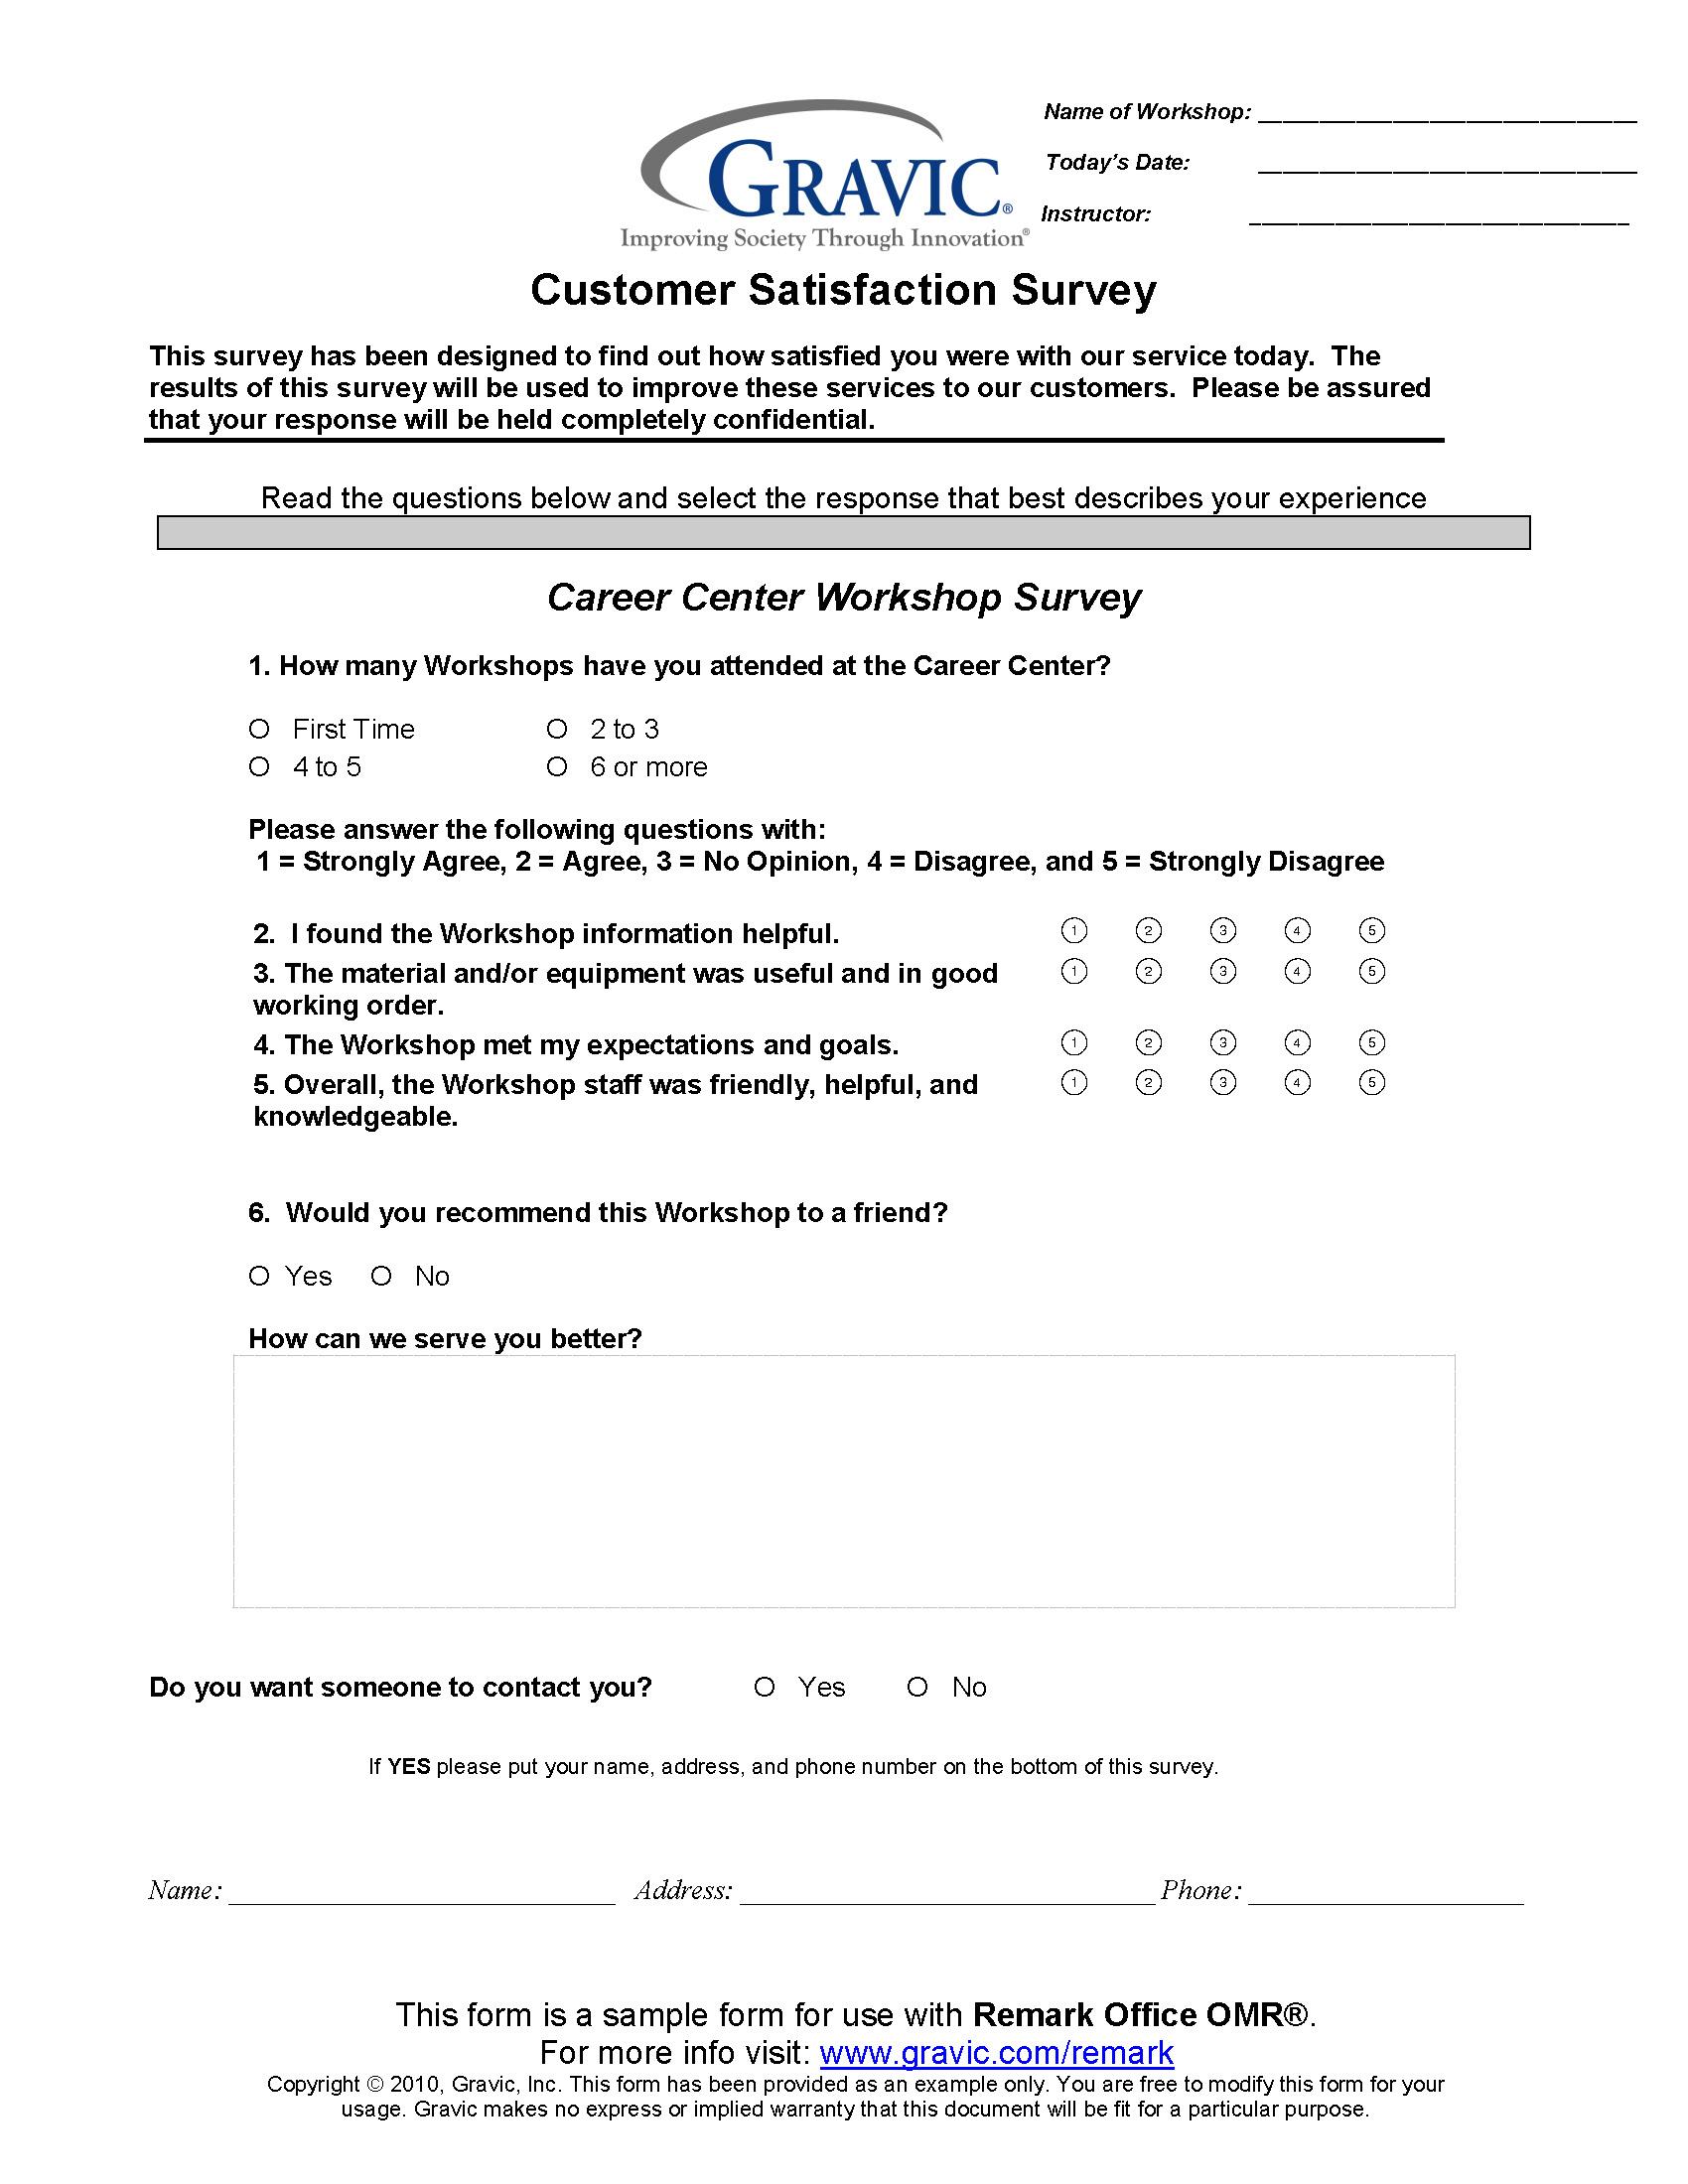 Questionnaire on store design